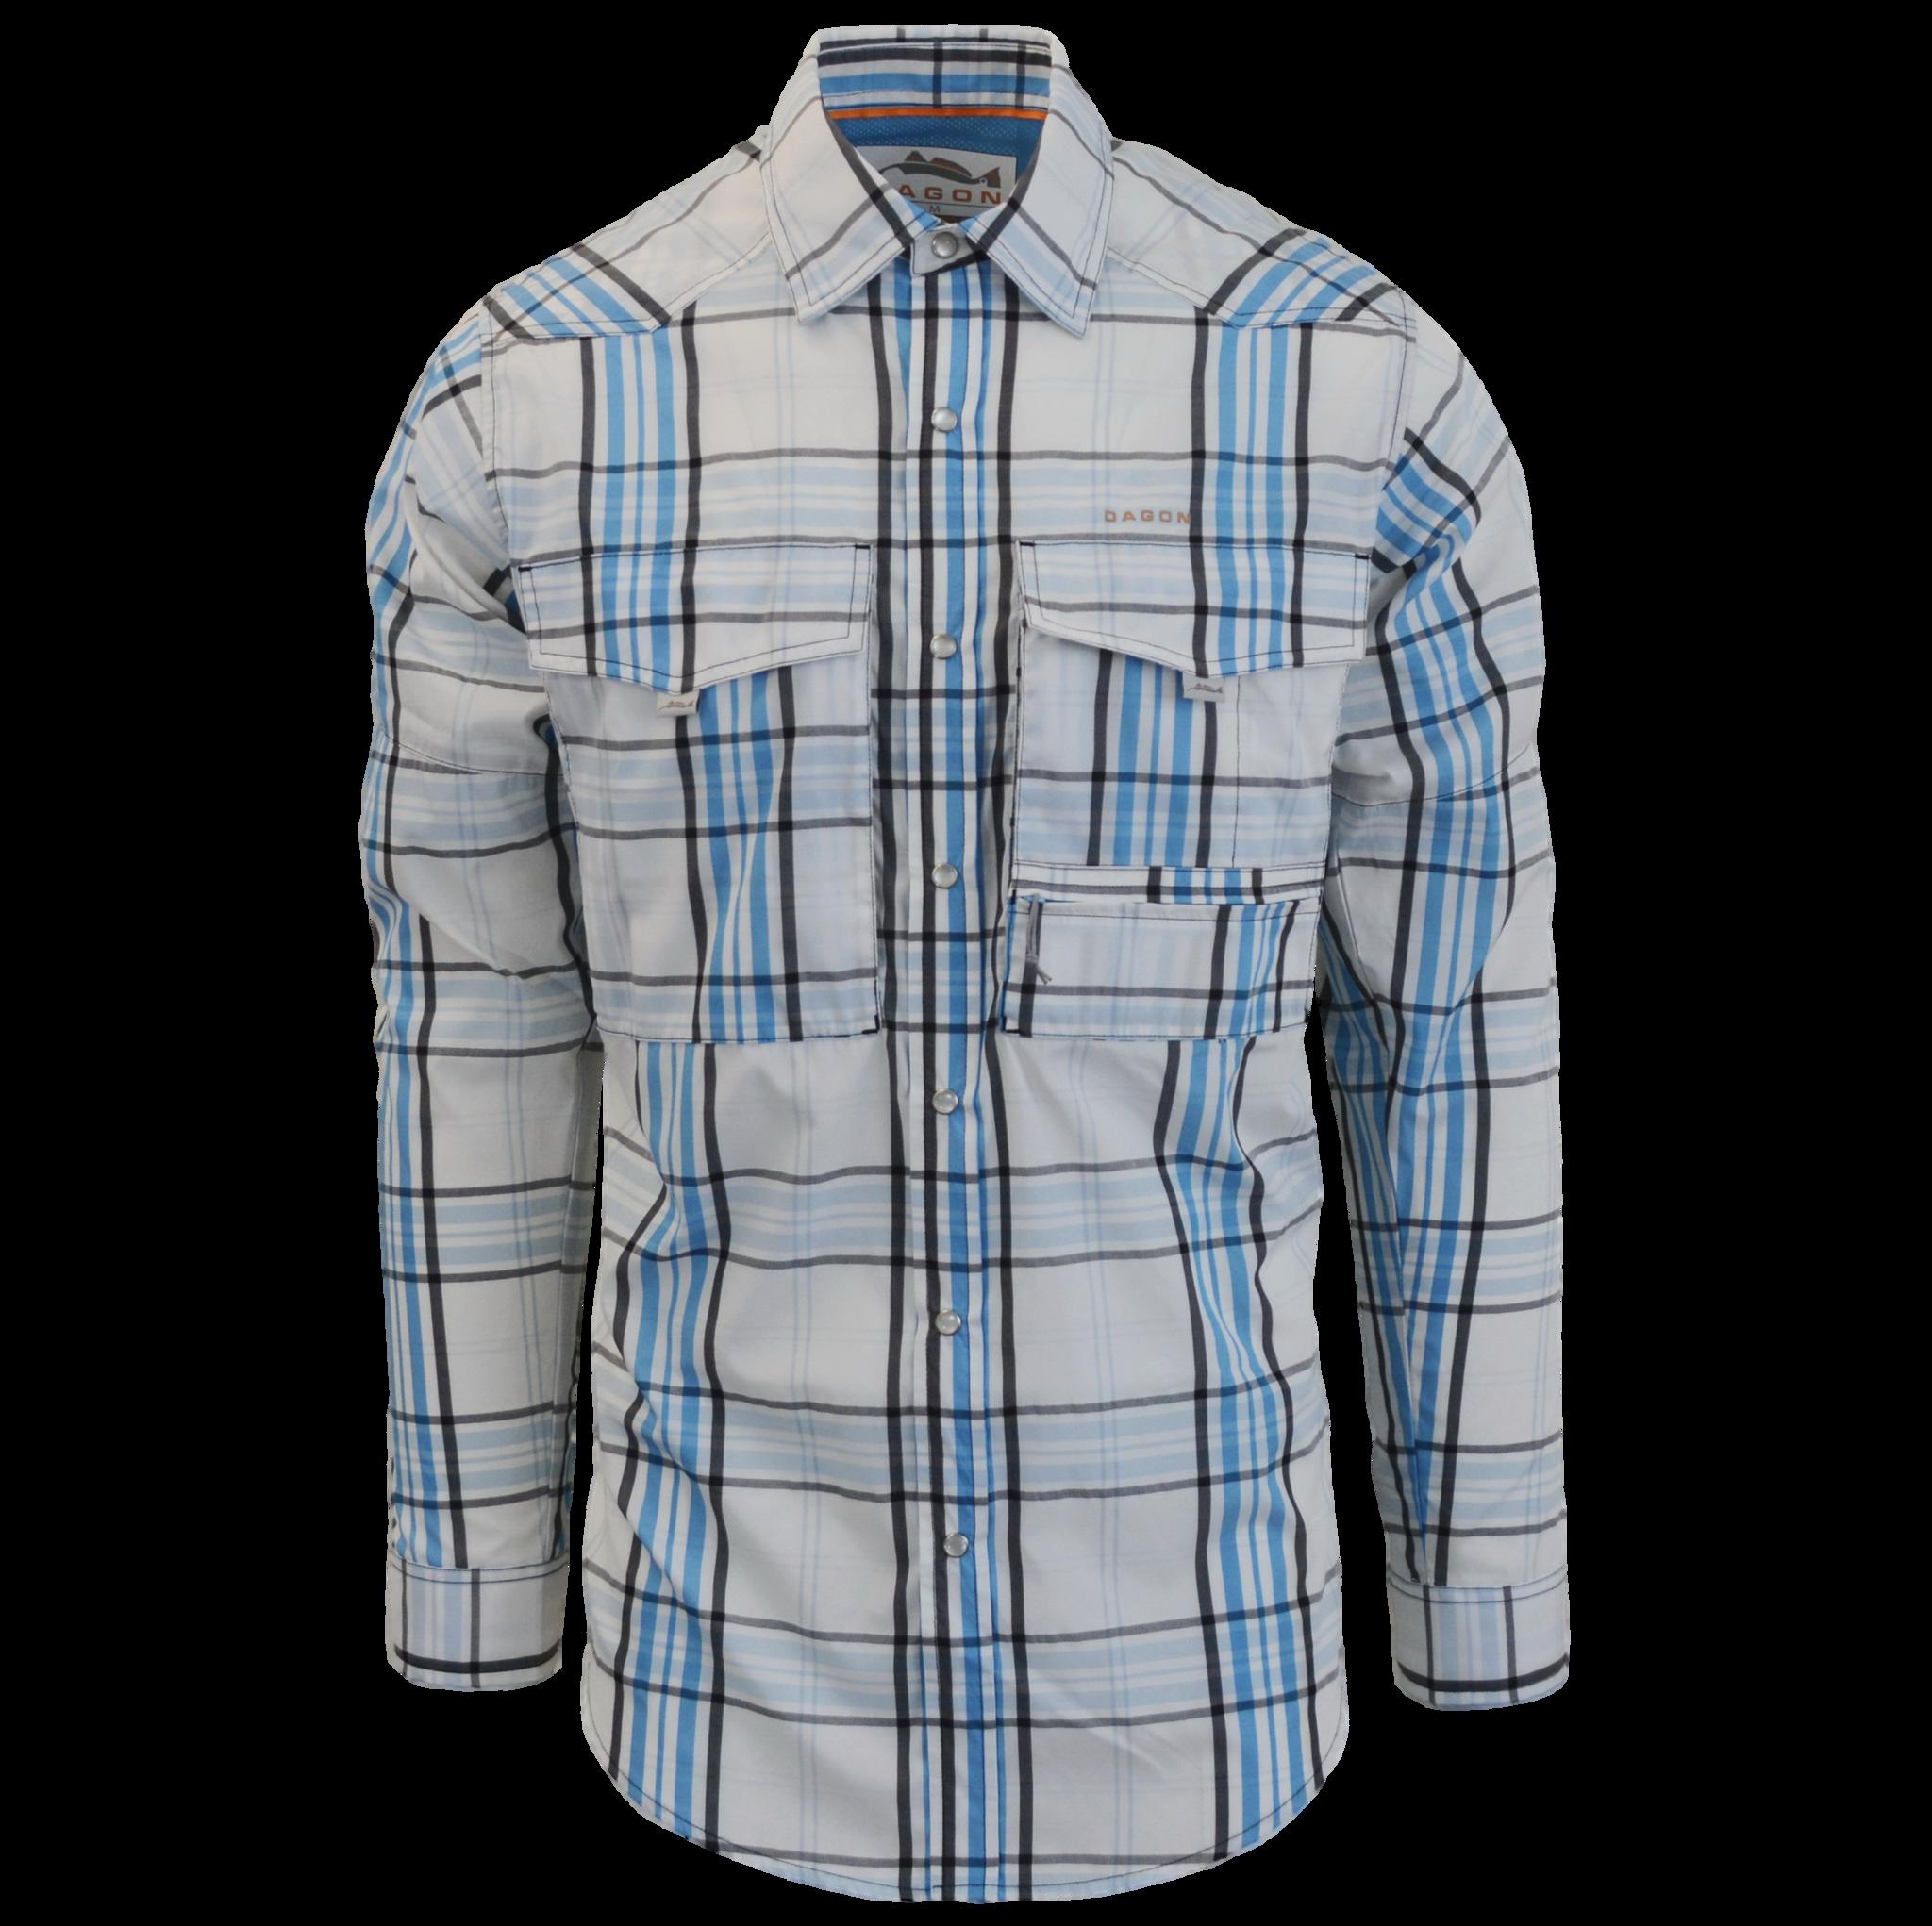 Fly Fishing Snap Button Shirt: Dagon Western